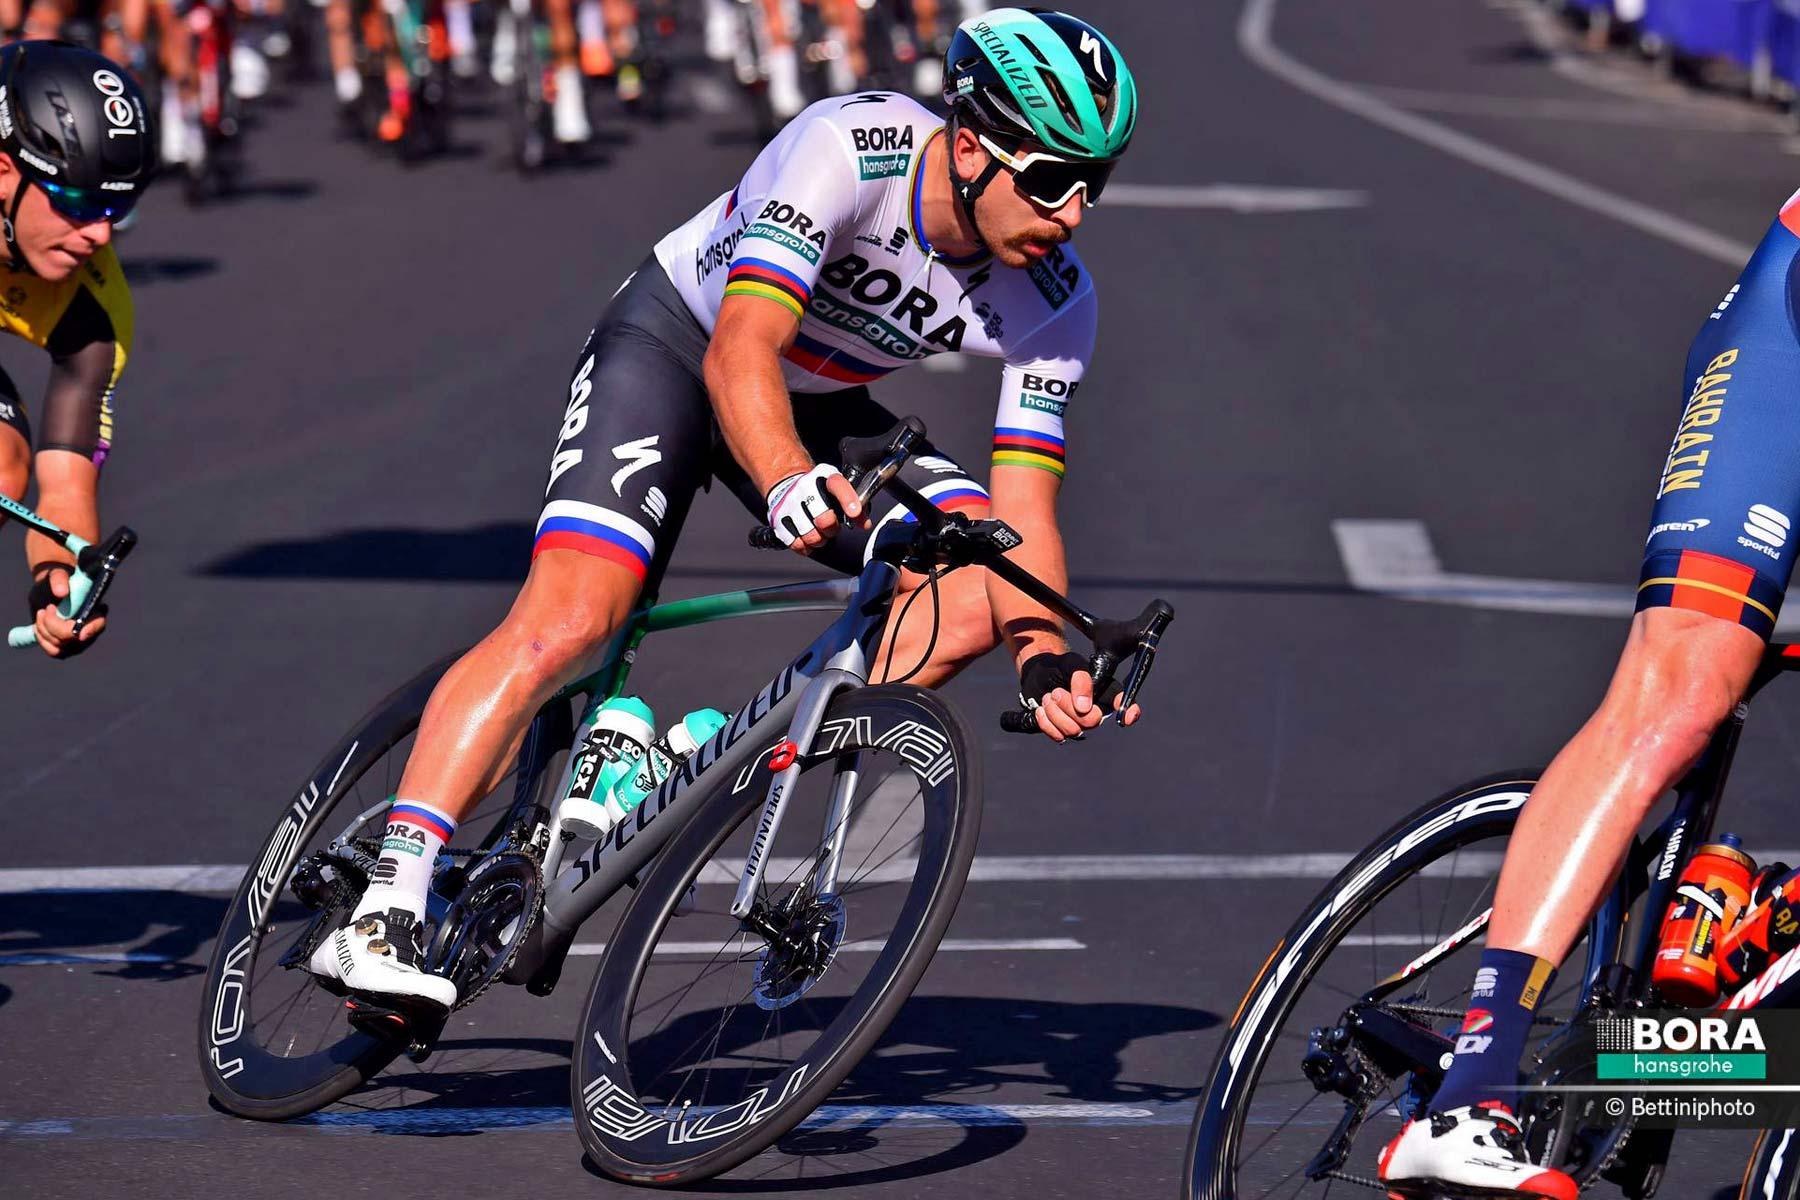 Specialized-Allez-Sprint-Disc_BORA-edition_affordable-stiff-aluminum-aero-disc-brake-road-race-bike_Peter-Sagan-Down-Under-Classic-crit_courtesy-Bora-hansgrohe_photo-by-Bettiniphoto.jpg